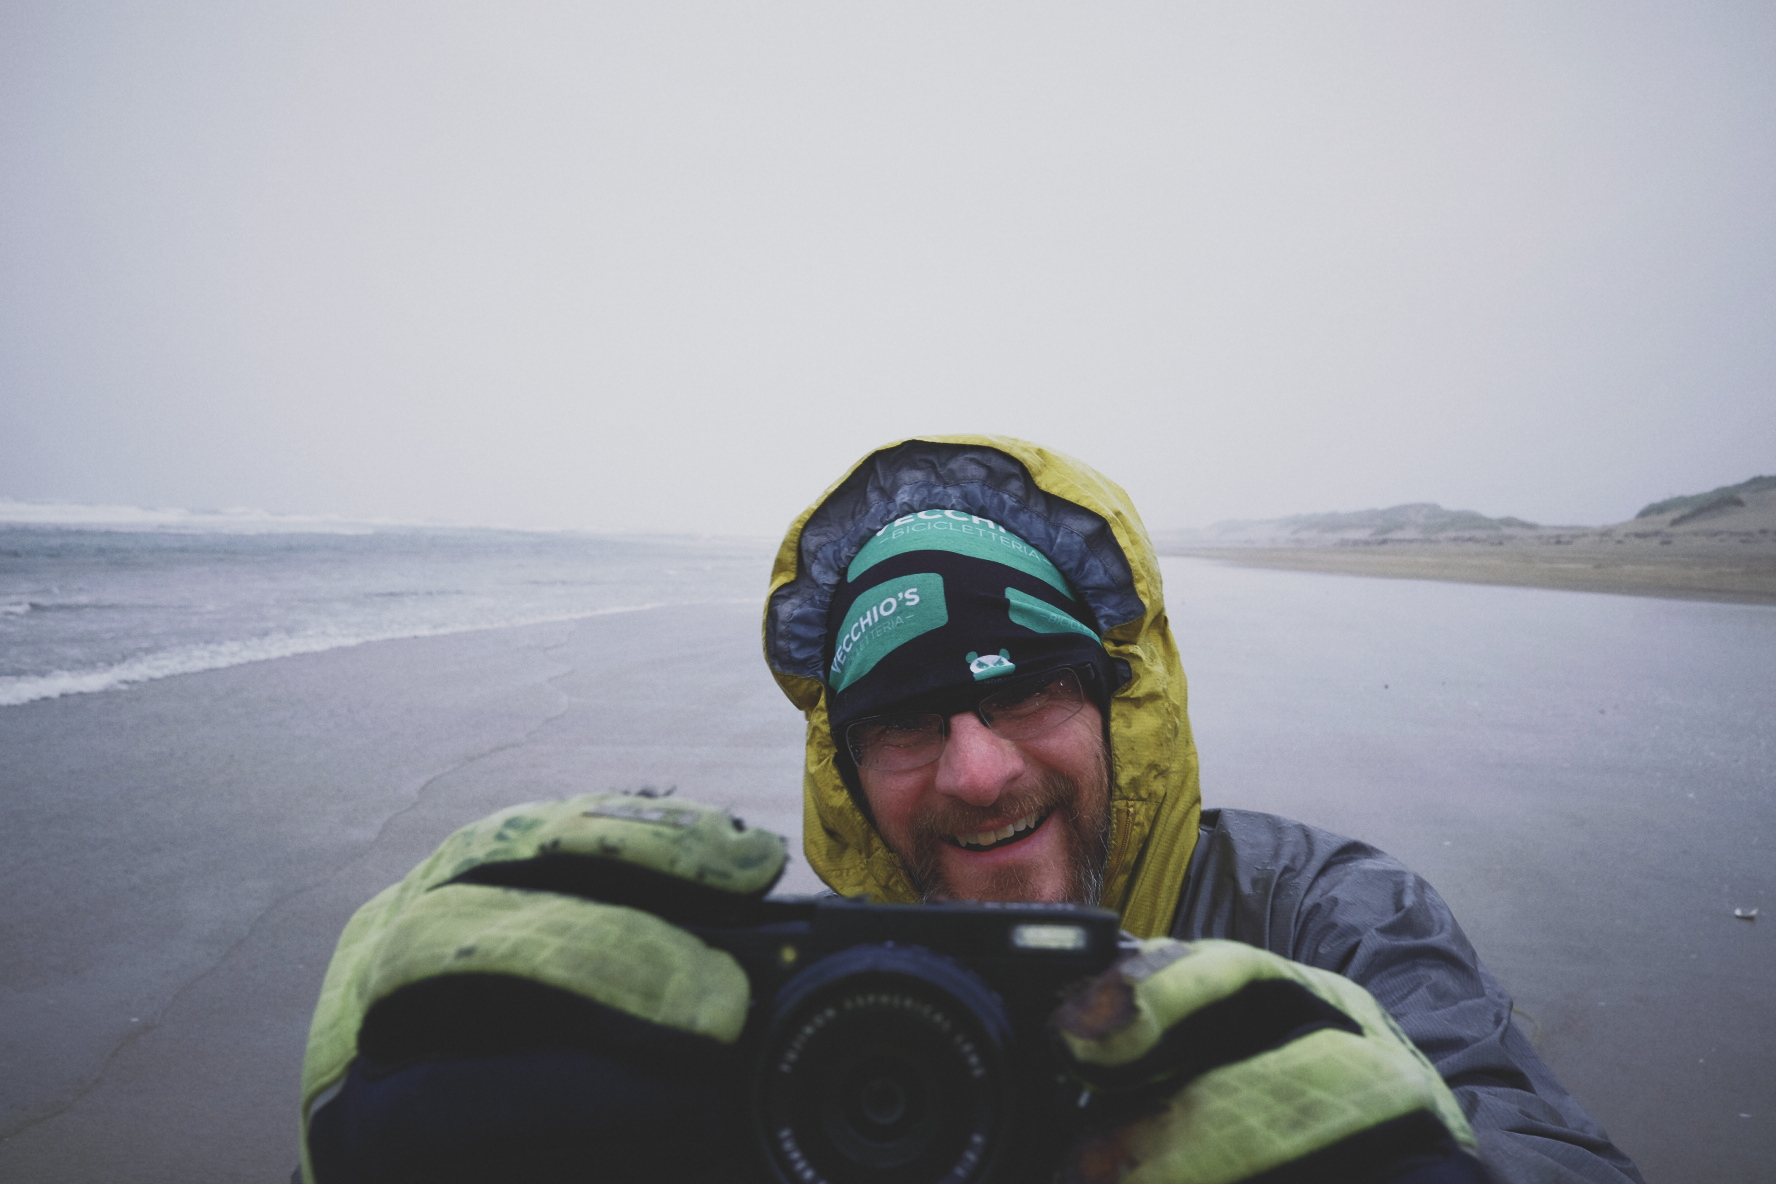 Fuji X Photographer  Dan Bailey  shooting the X70 in a brutal Oregon coast rain storm